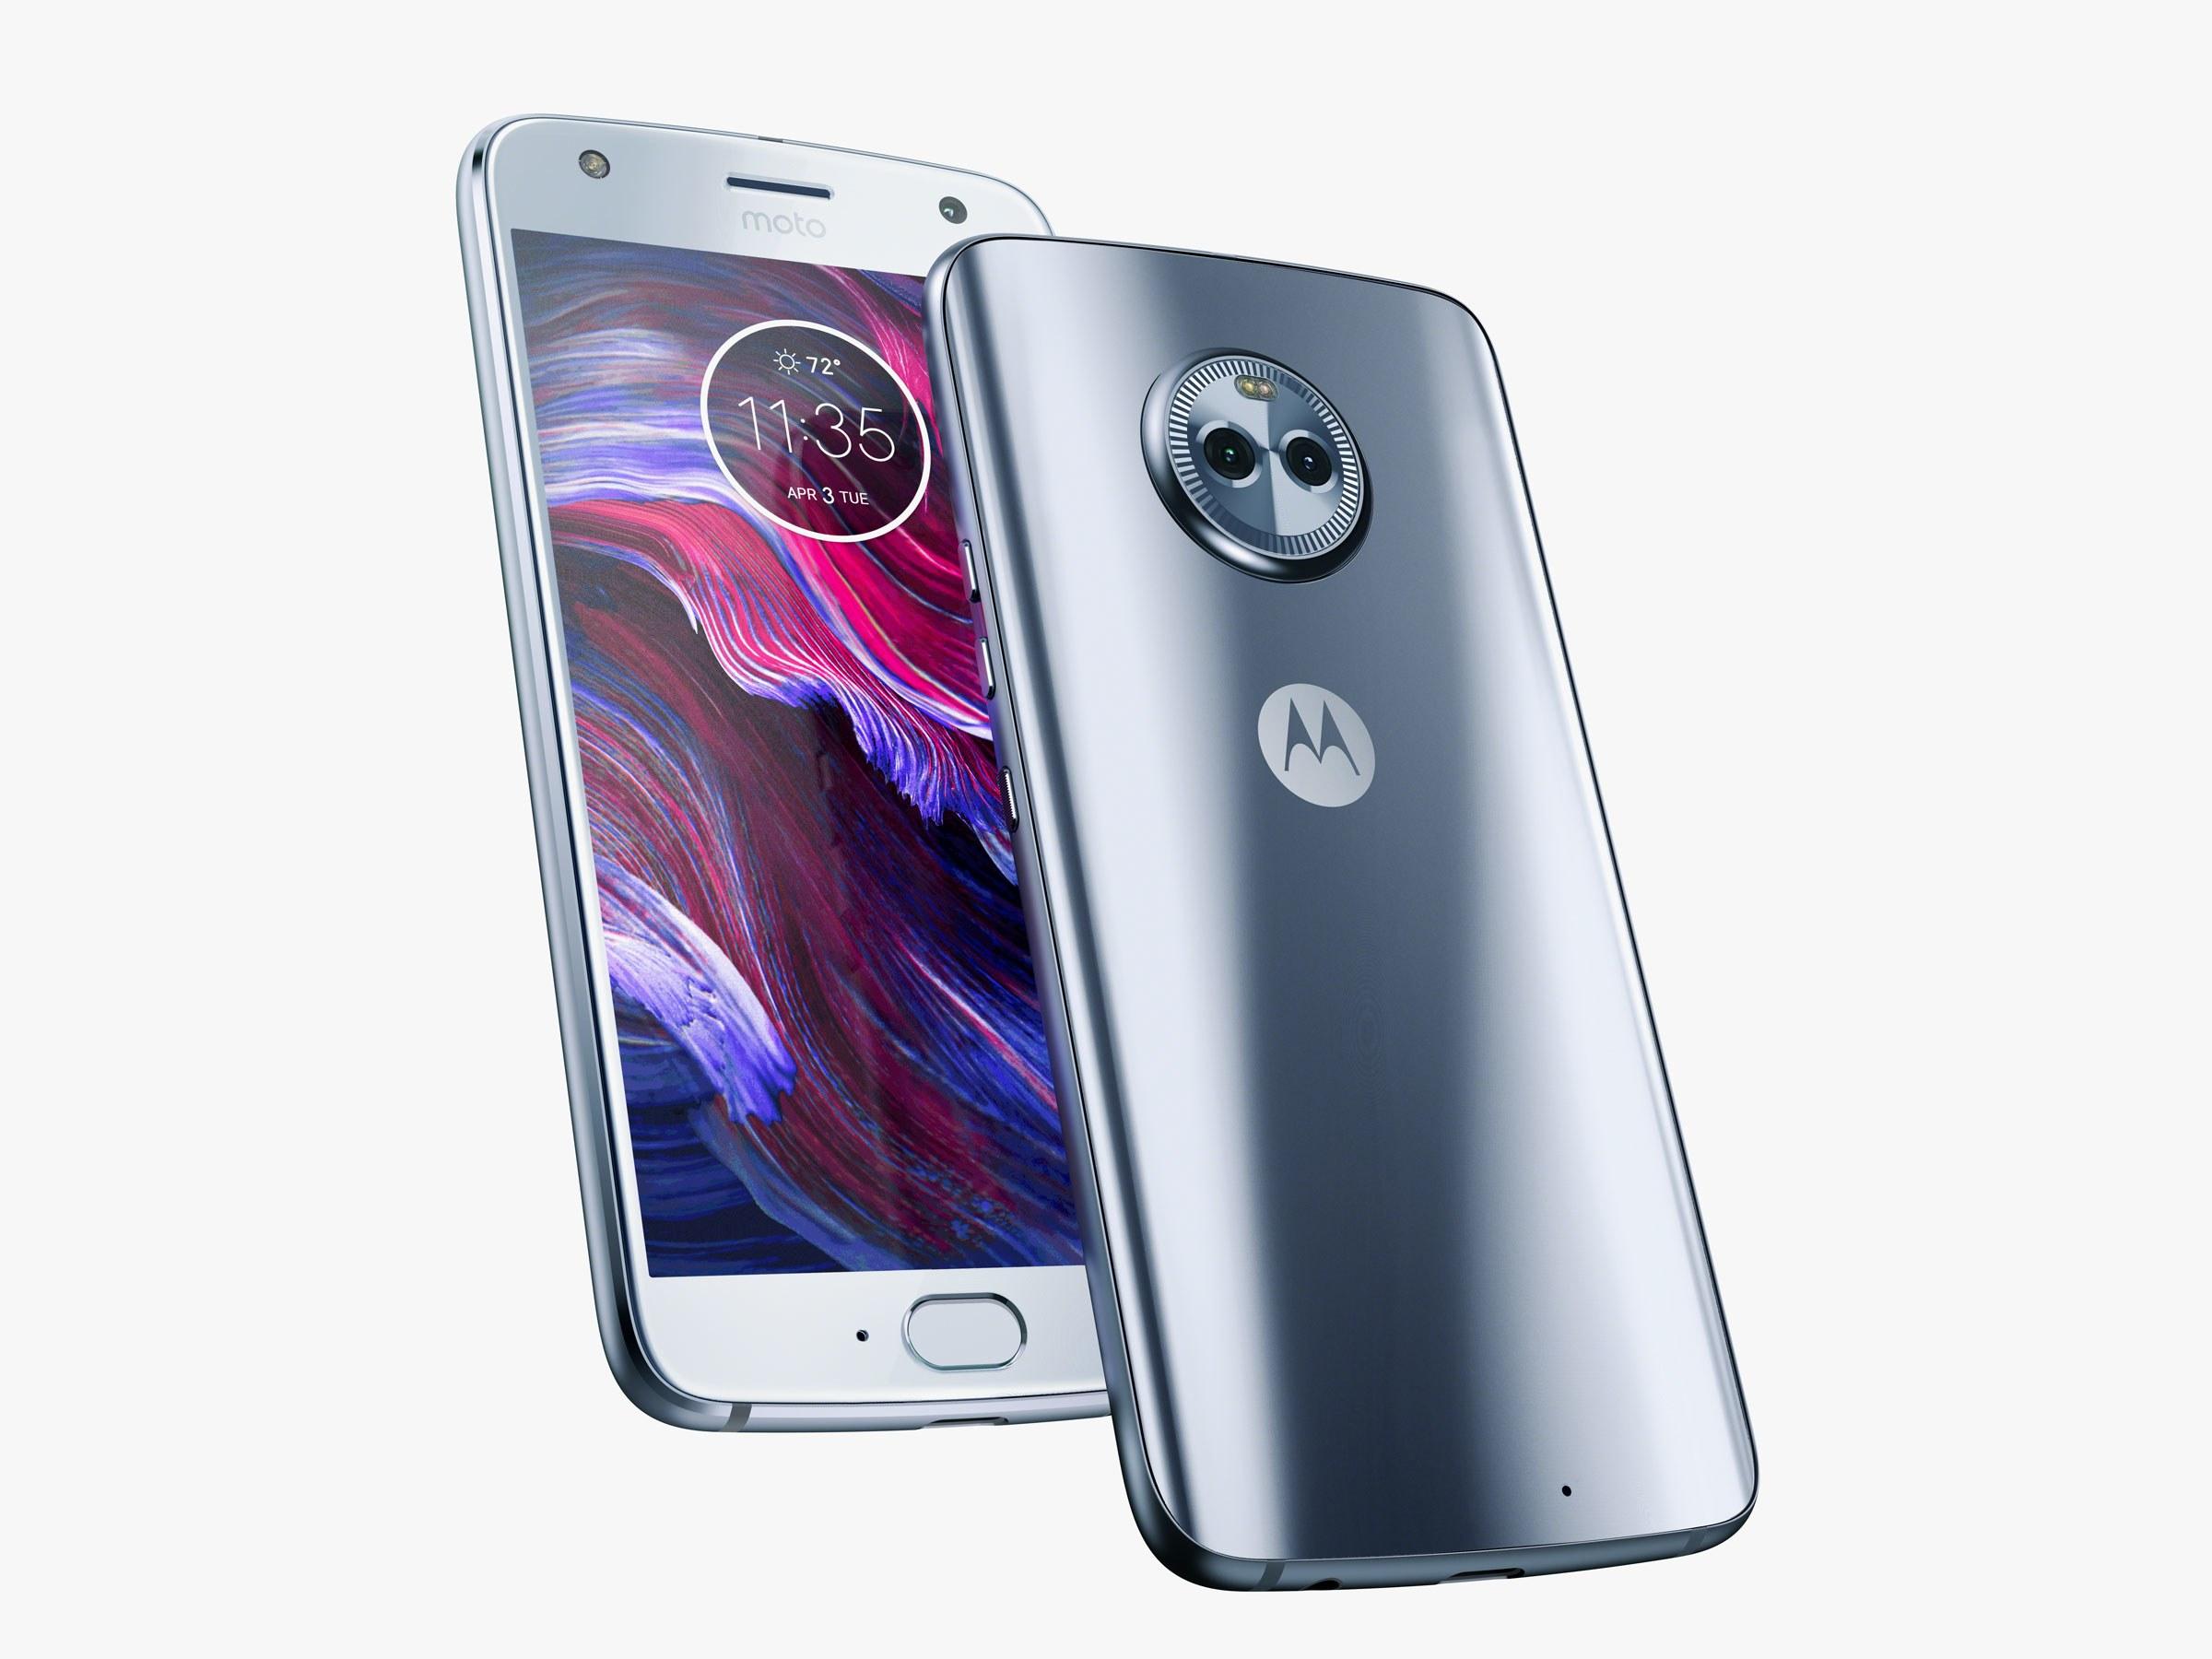 Motorola Moto X4 incelemesi: X sadece isim